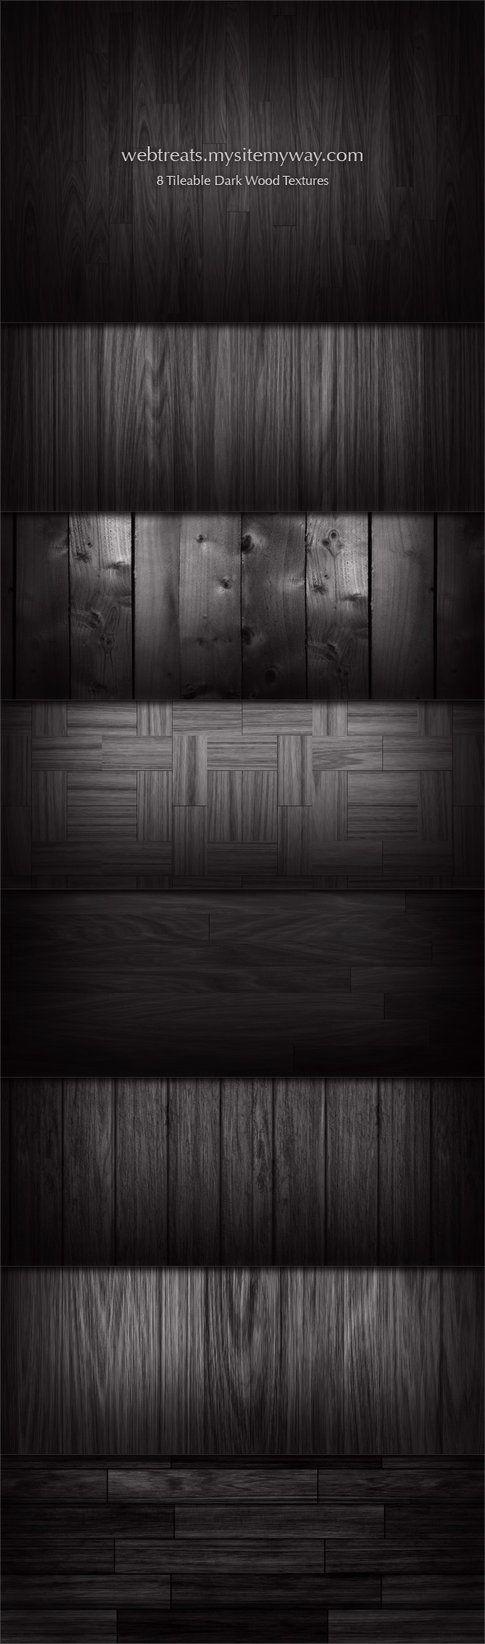 Bajar Fondo De Pantalla Gratis - Imagen En Hd 3 HD Wallpapers ...